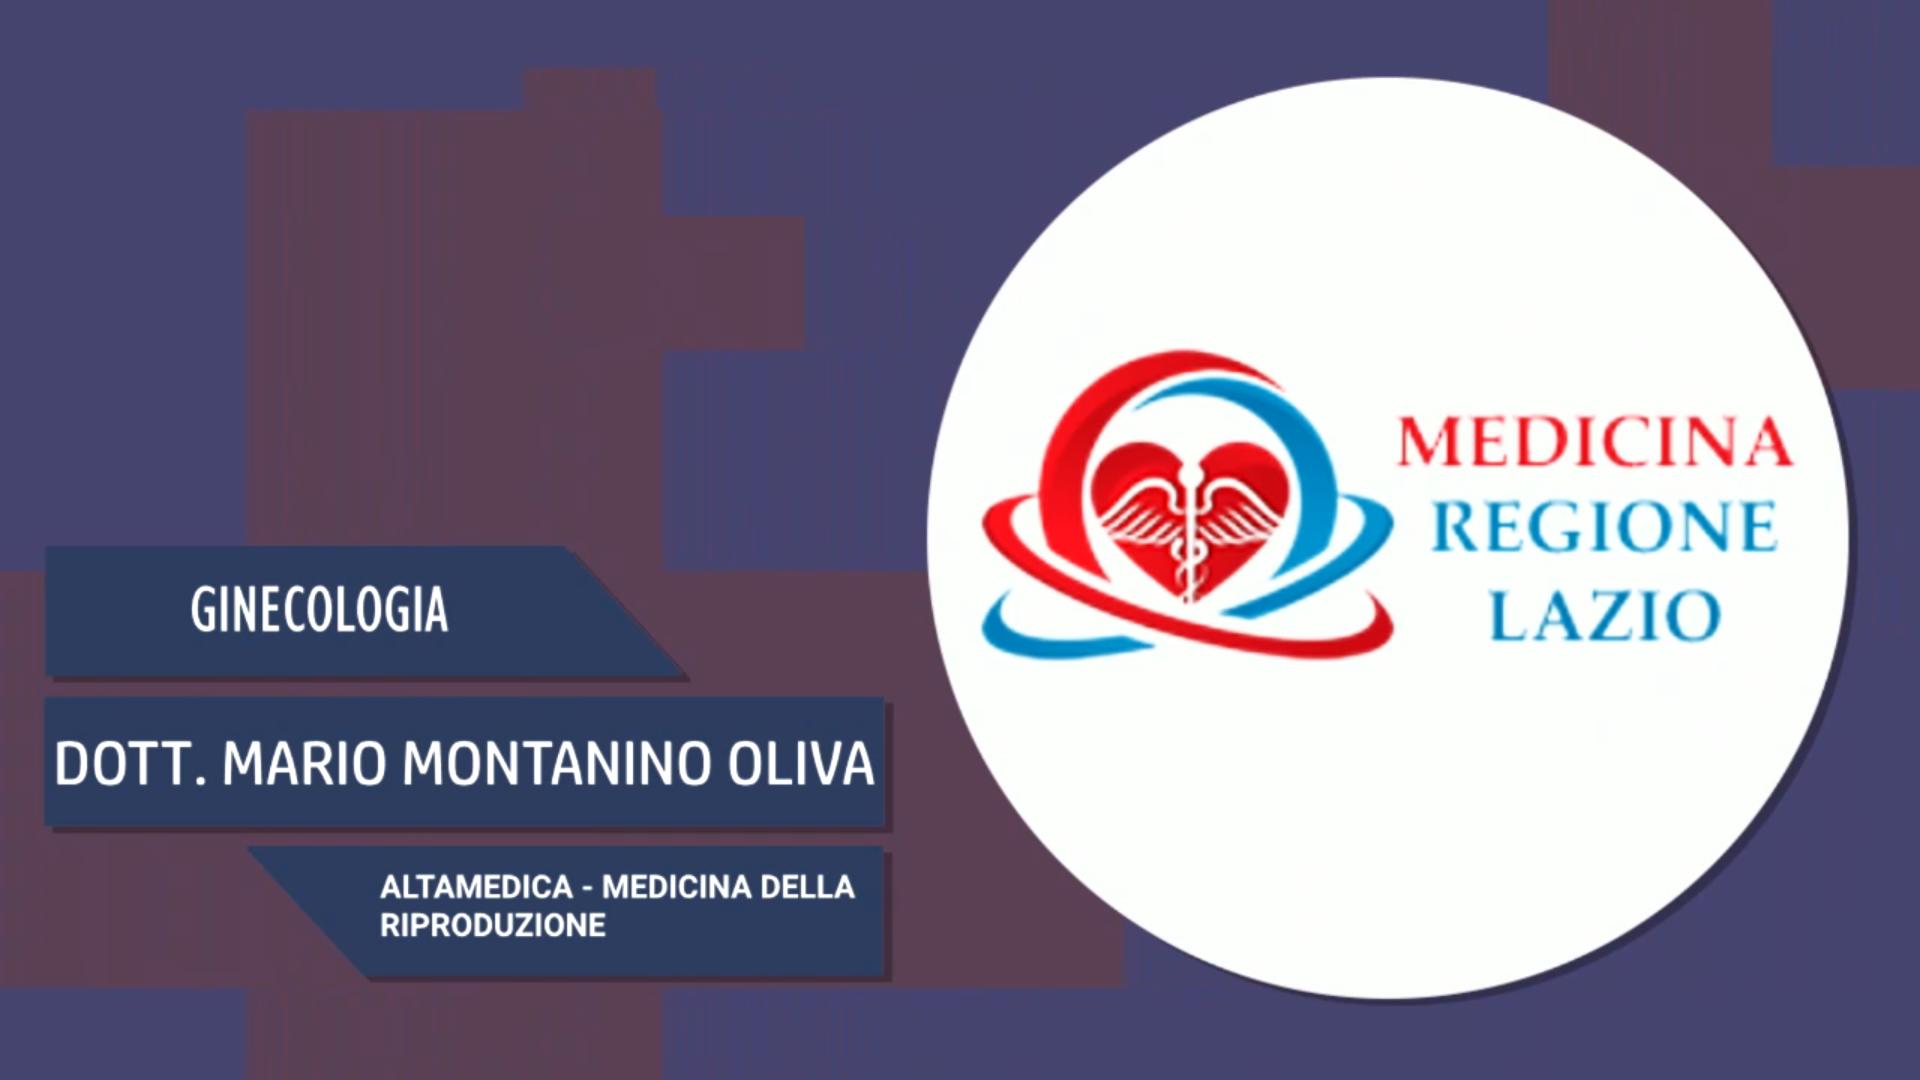 Intervista al Dott. Mario Montanino Oliva – Altamedica